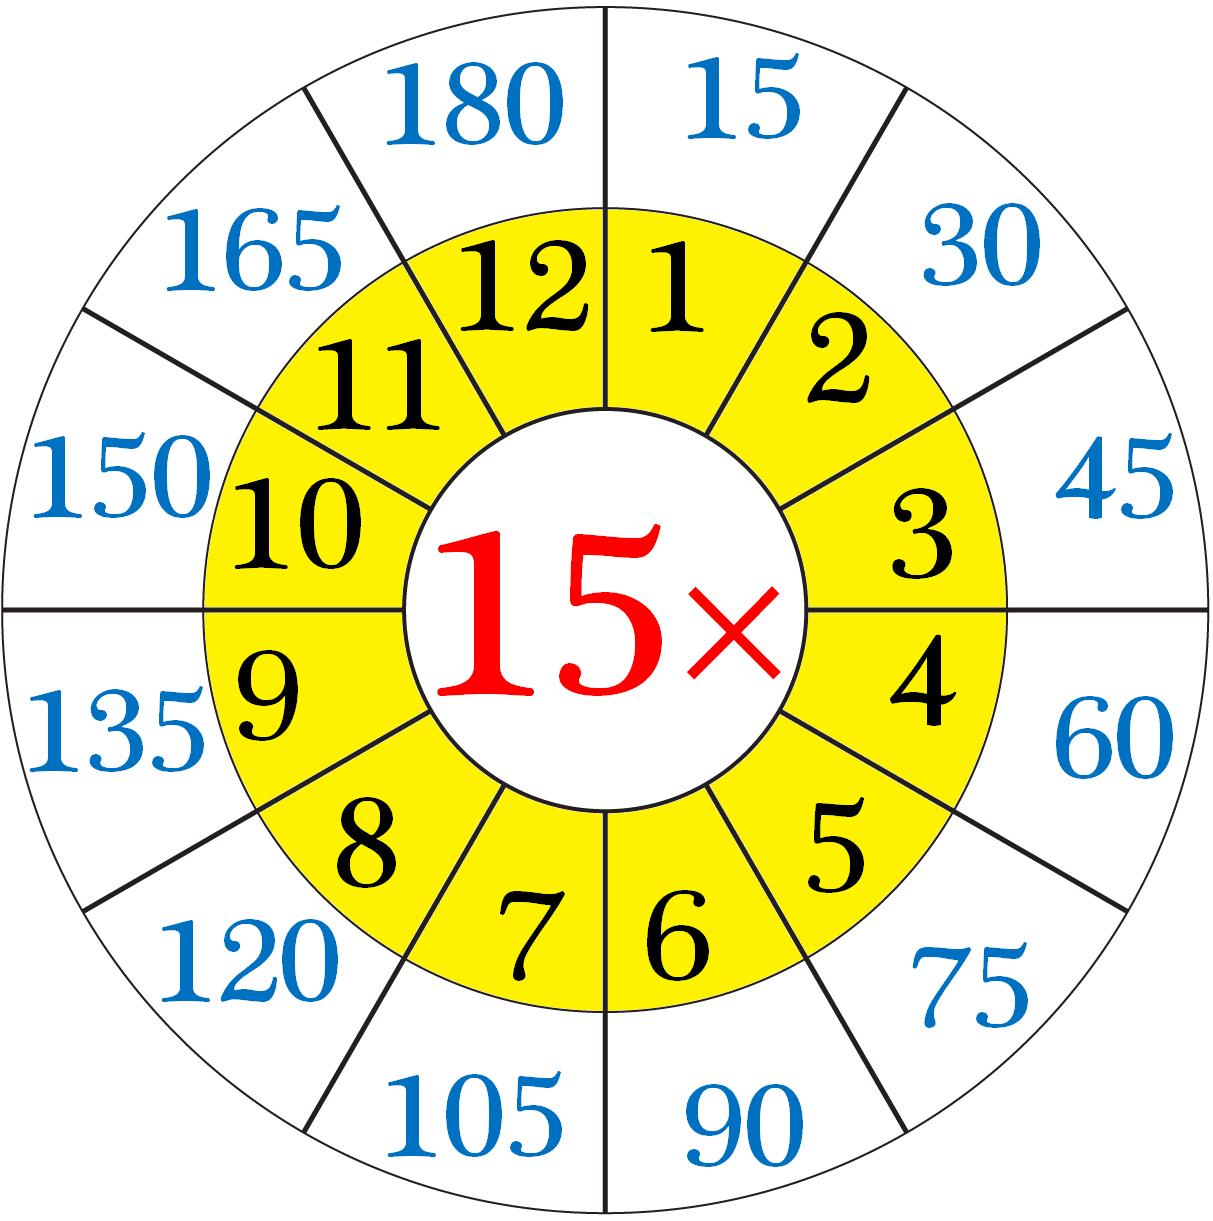 15 Times Multiplication Table Sheet